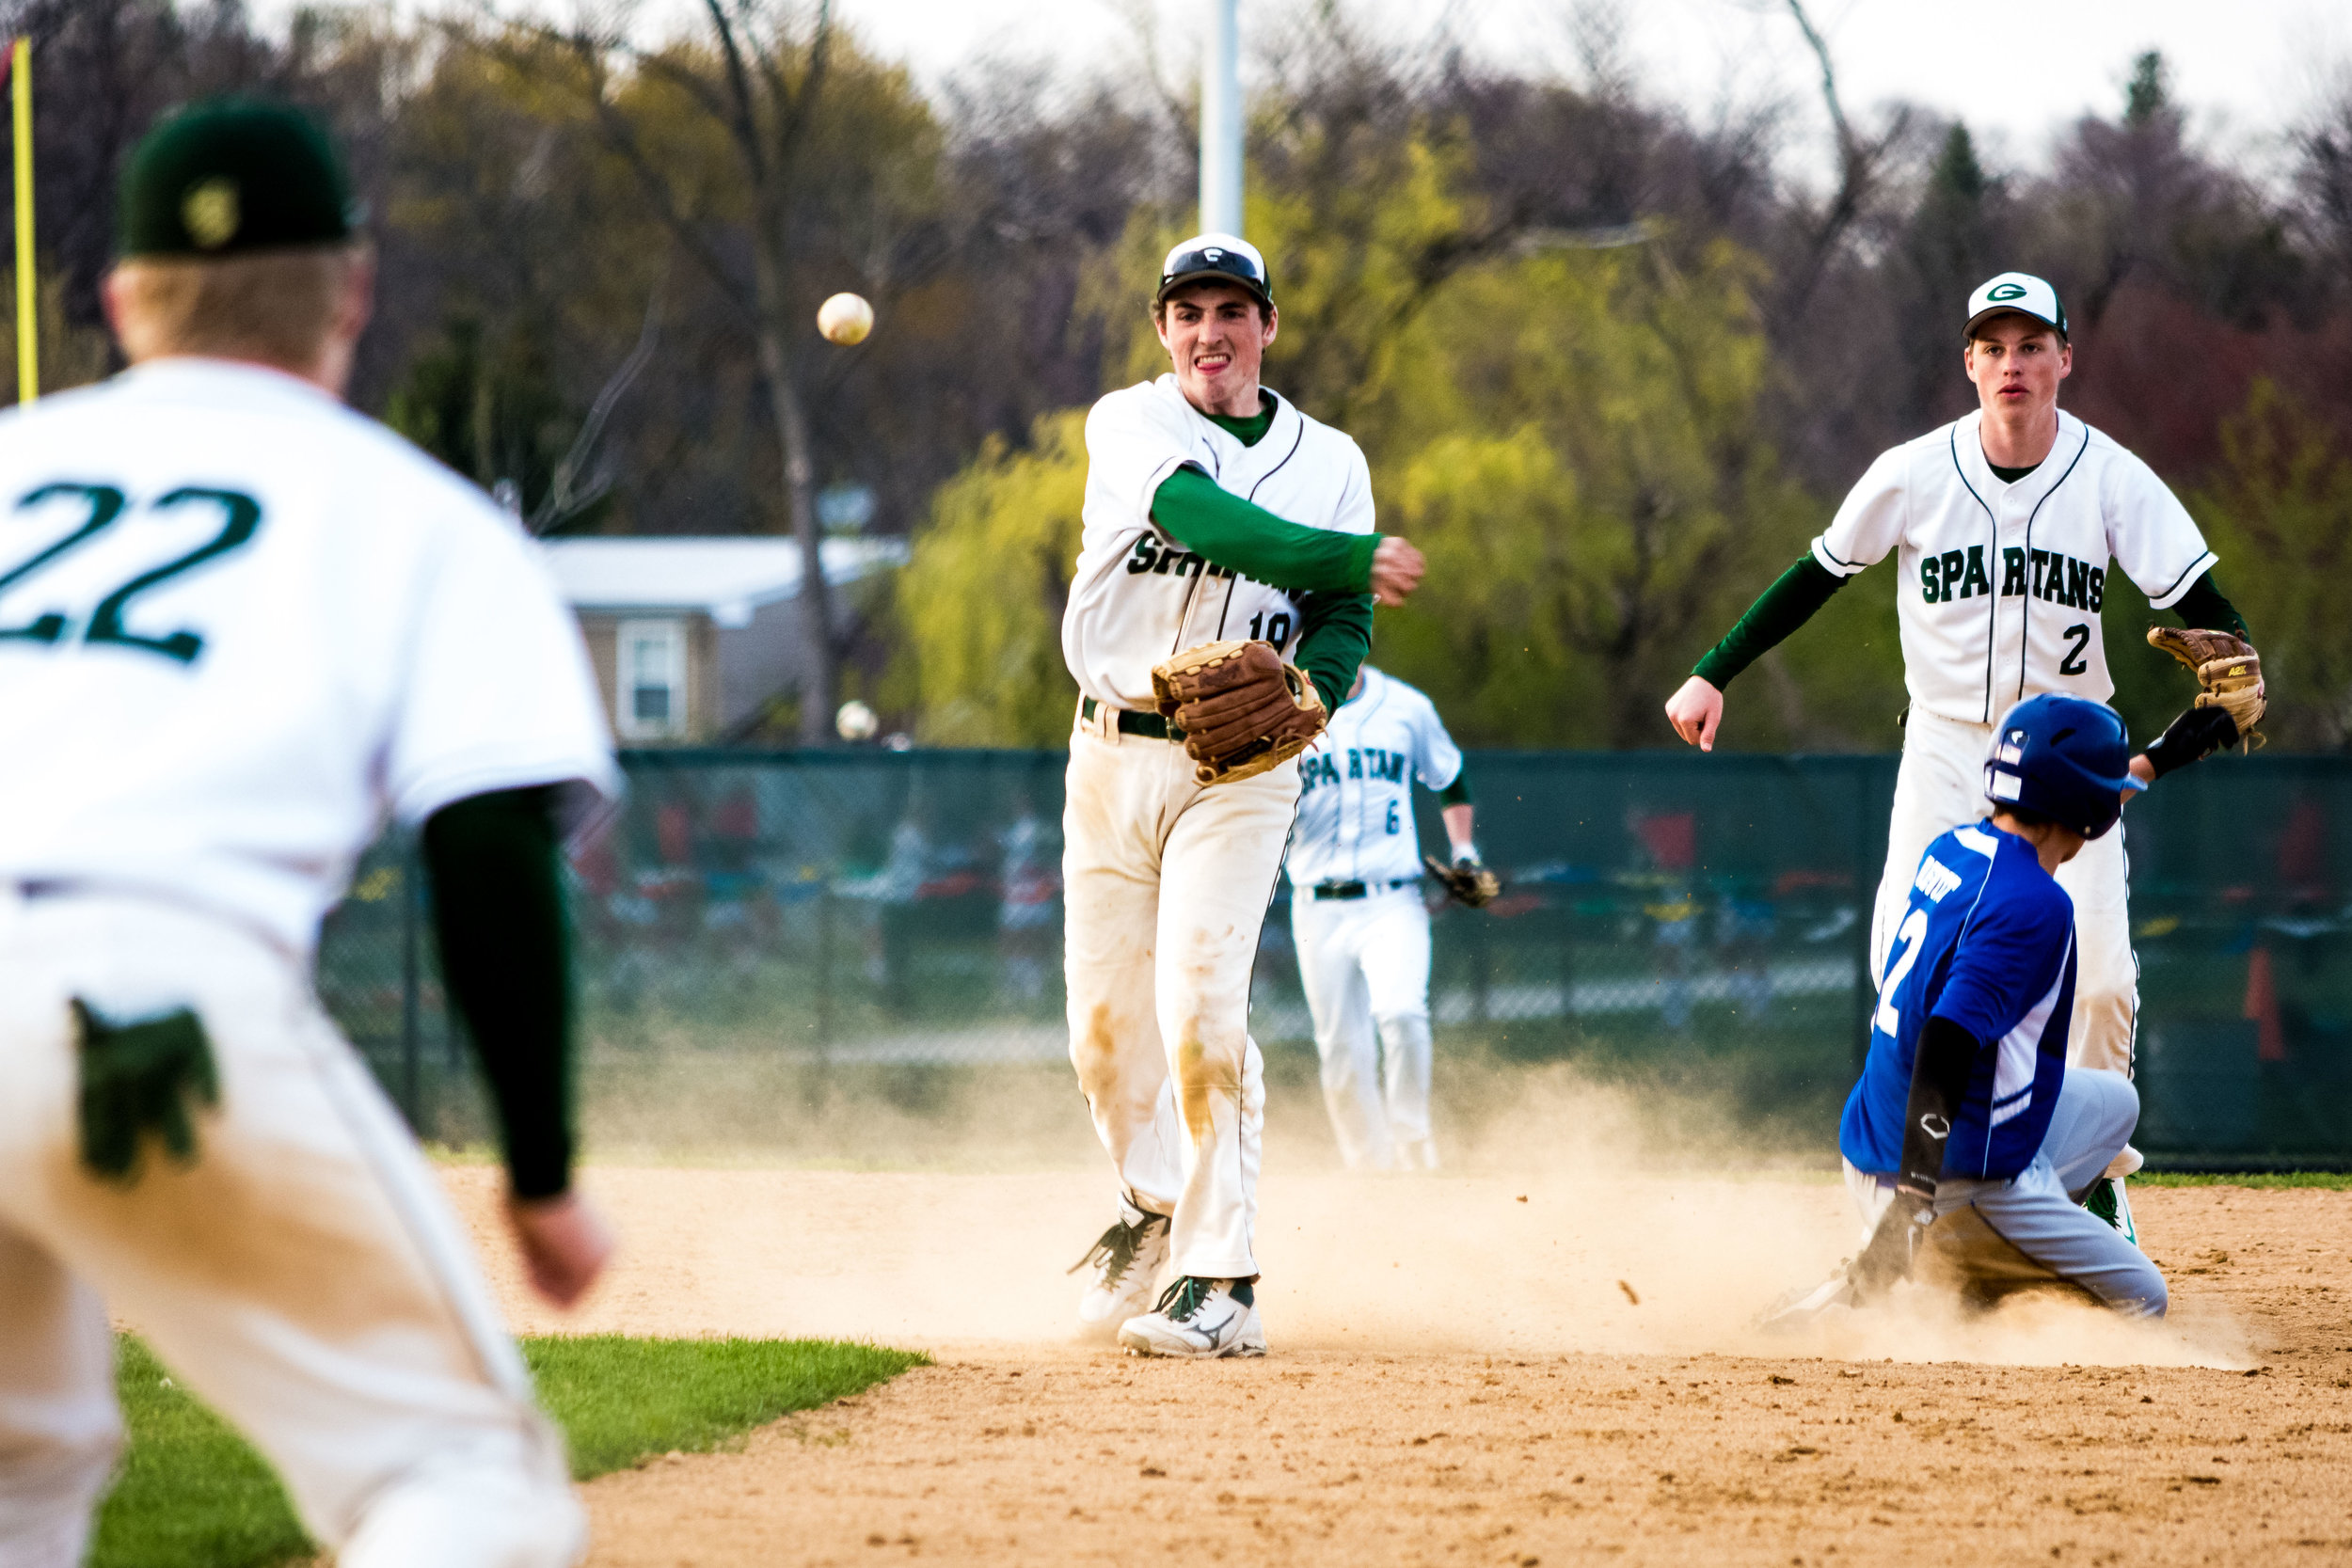 Porter_Photo_Sports-20.jpg